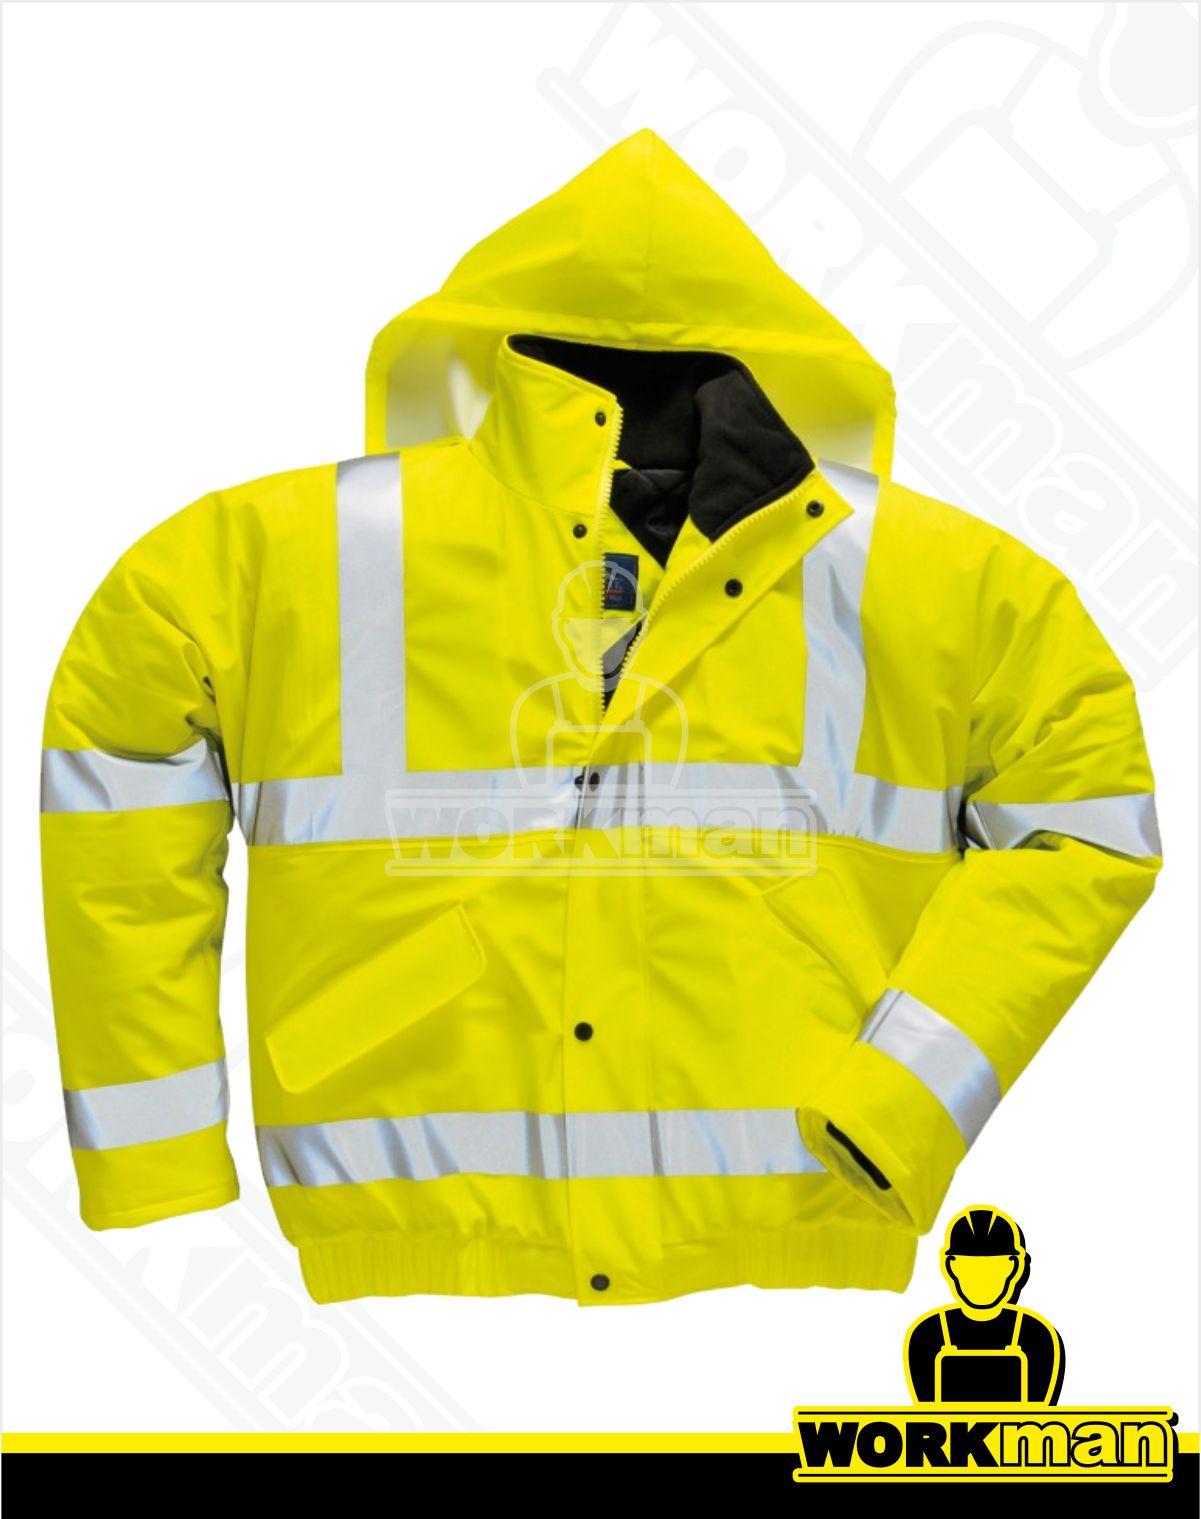 deef2e1d8721 Reflexná bunda Hi-vis PILOT S498 Portwest Pracovné odevy WORKMAN